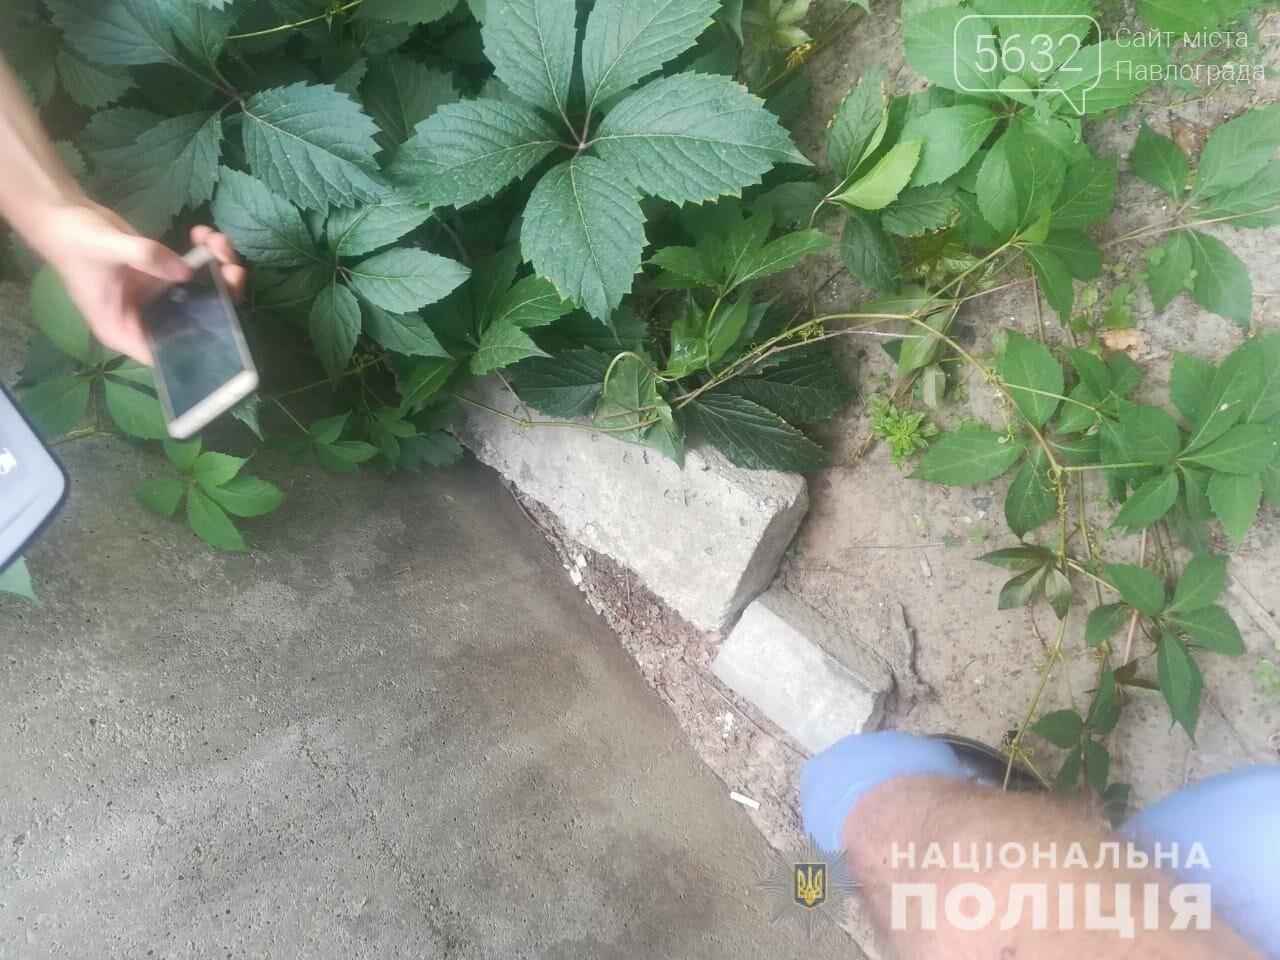 В Павлограде задержали закладчика наркотиков, фото-1